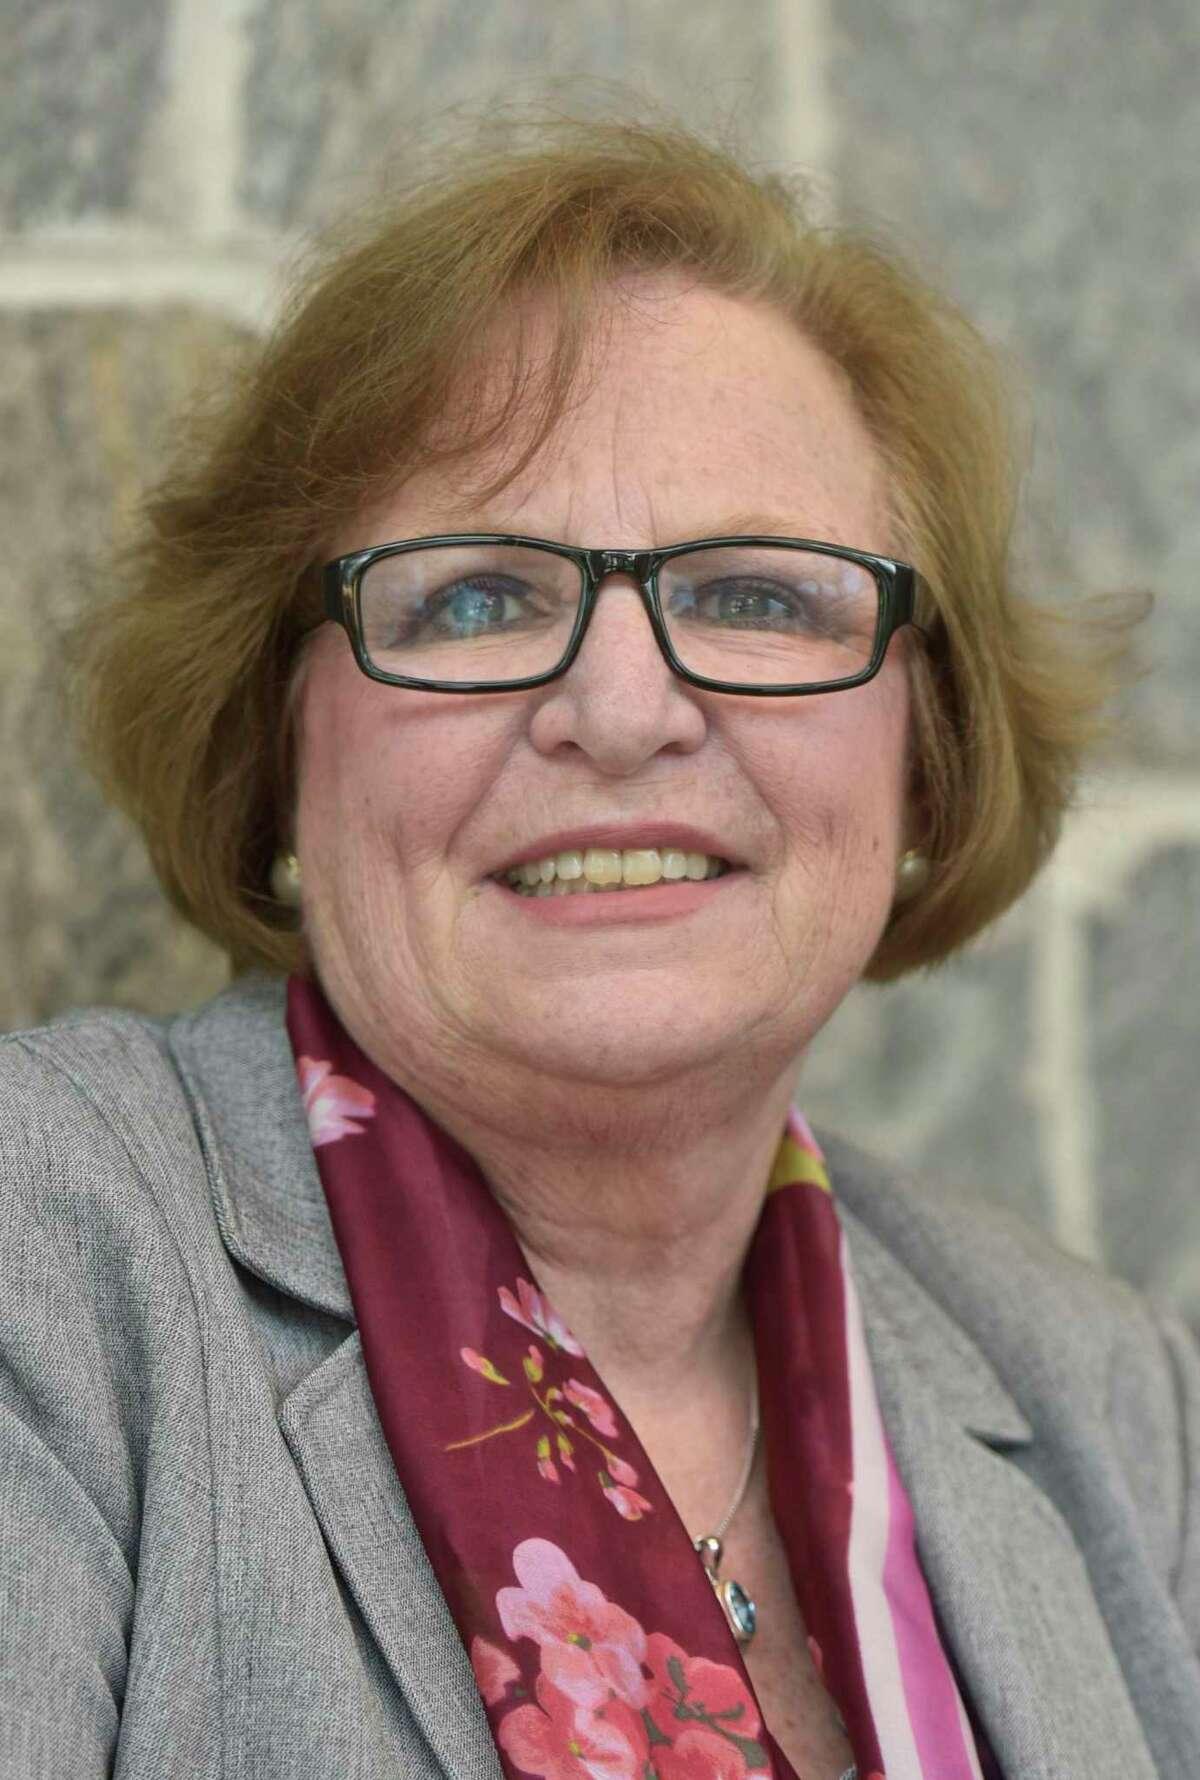 New Fairfield Superintendent Pat Cosentino